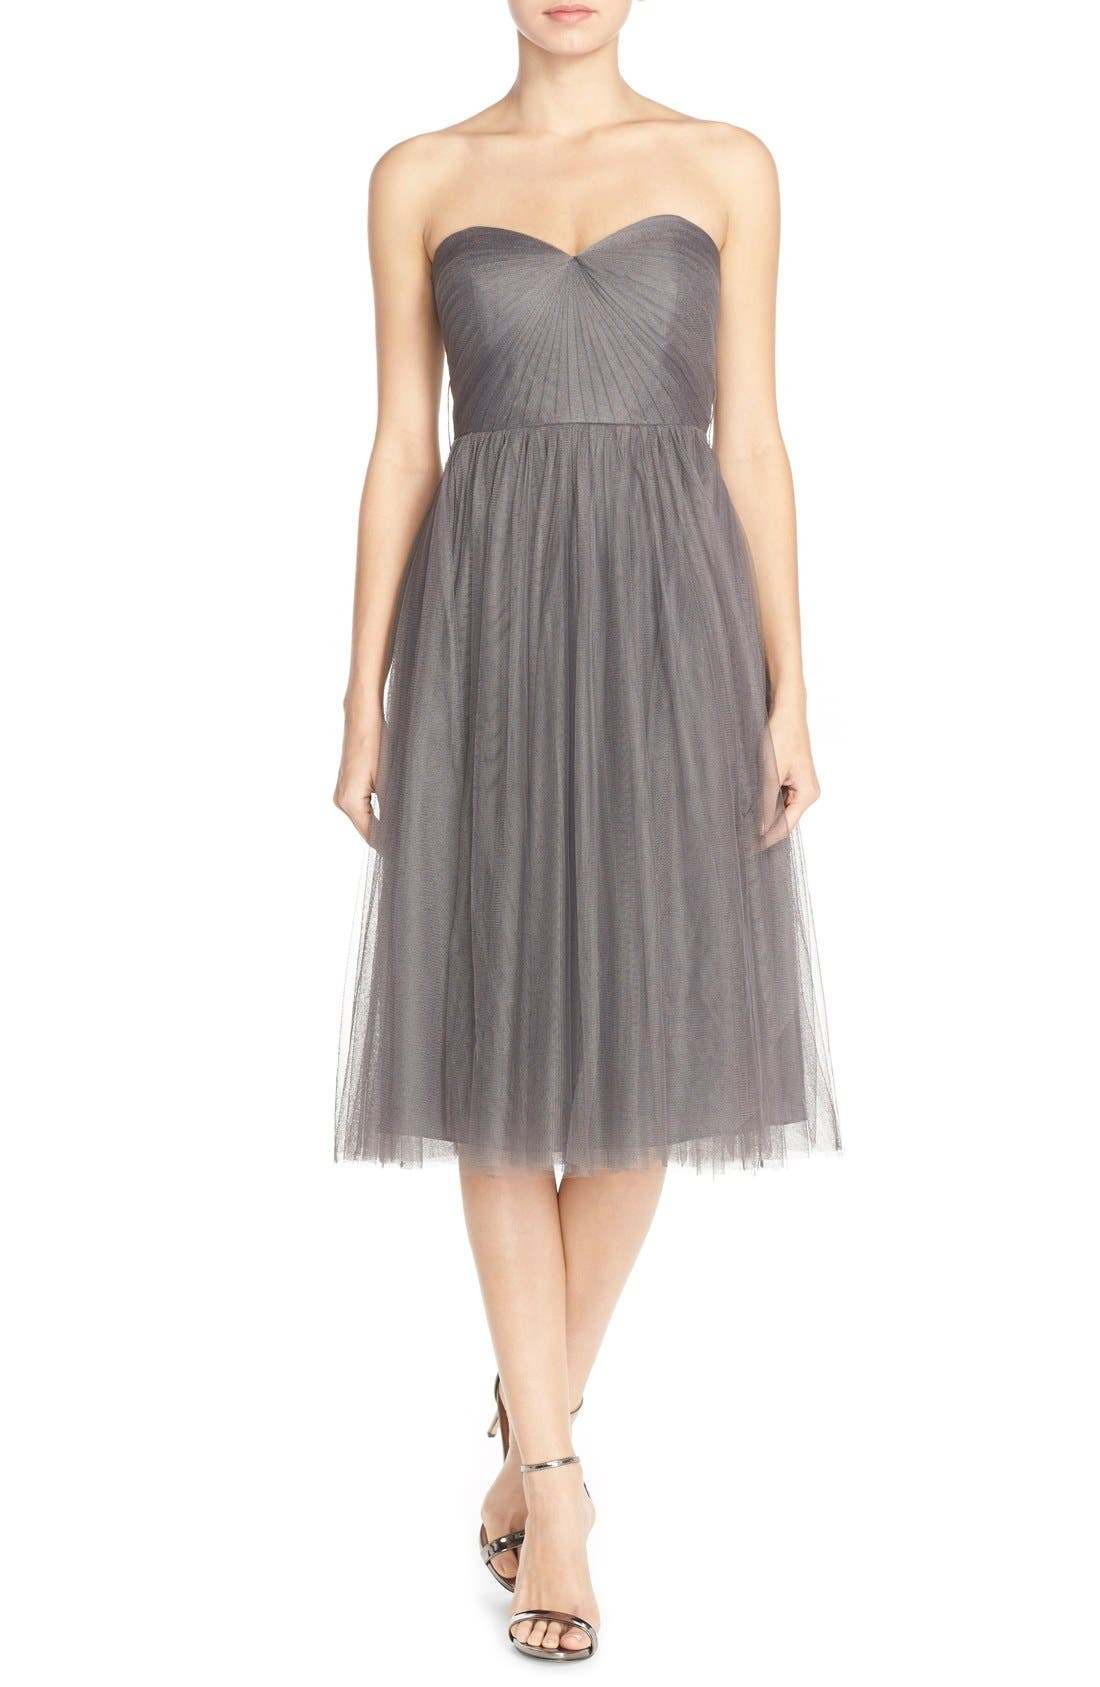 Maia Convertible Tulle Tea Length Fit & Flare Dress,                             Main thumbnail 1, color,                             028